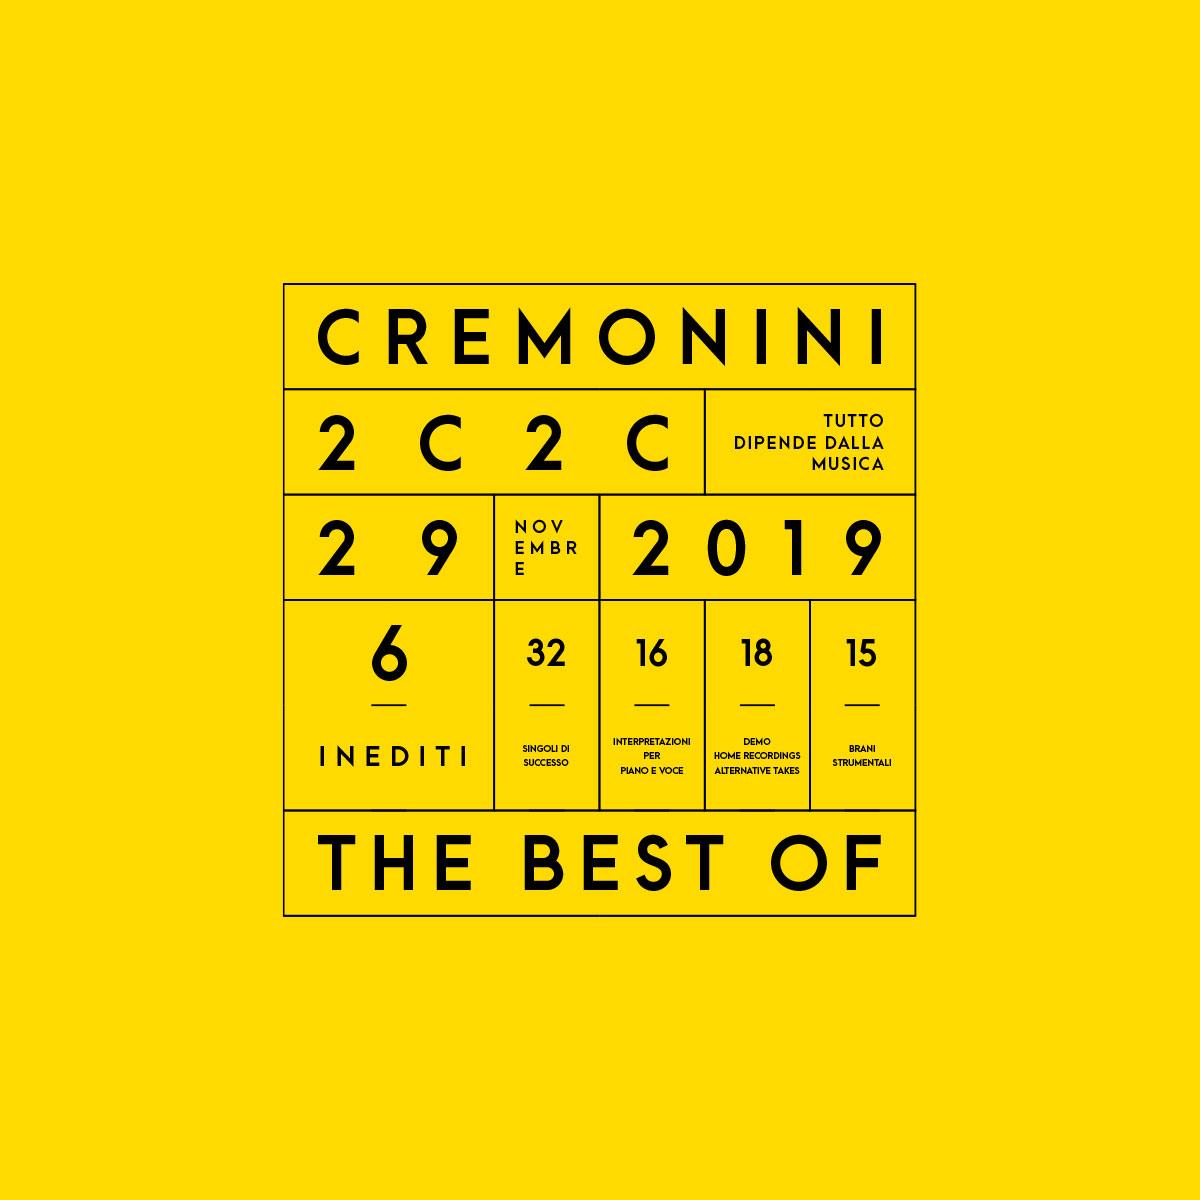 Cesare Cremonini Visual TheBestOf - Design Umberto Angelini